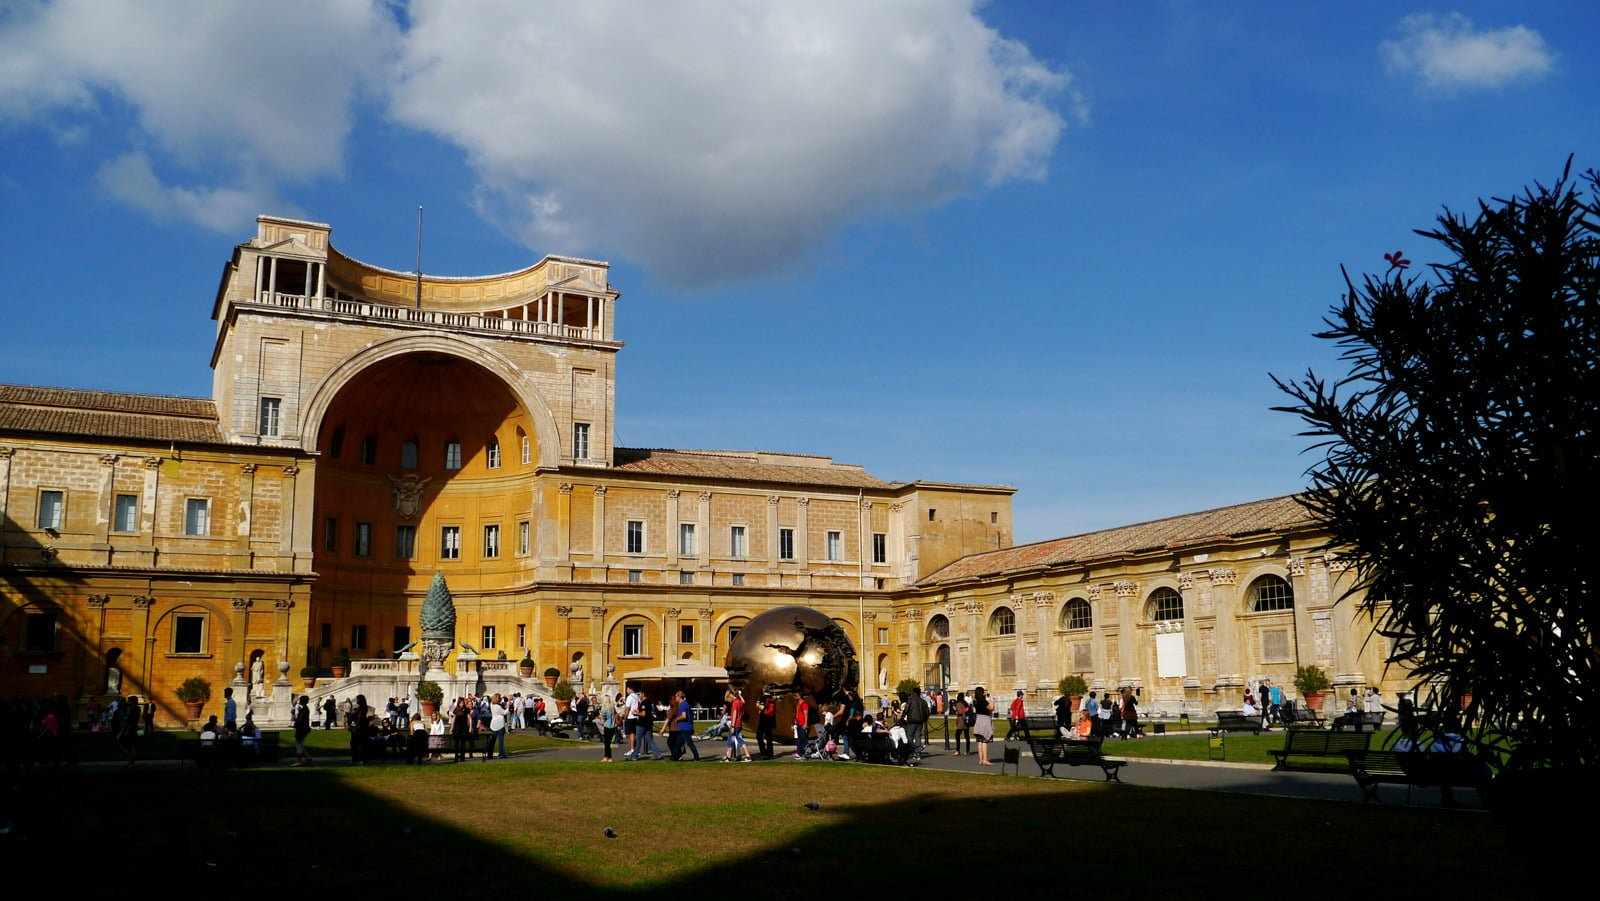 Are 'skip the line' tours of the Vatican legitimate?